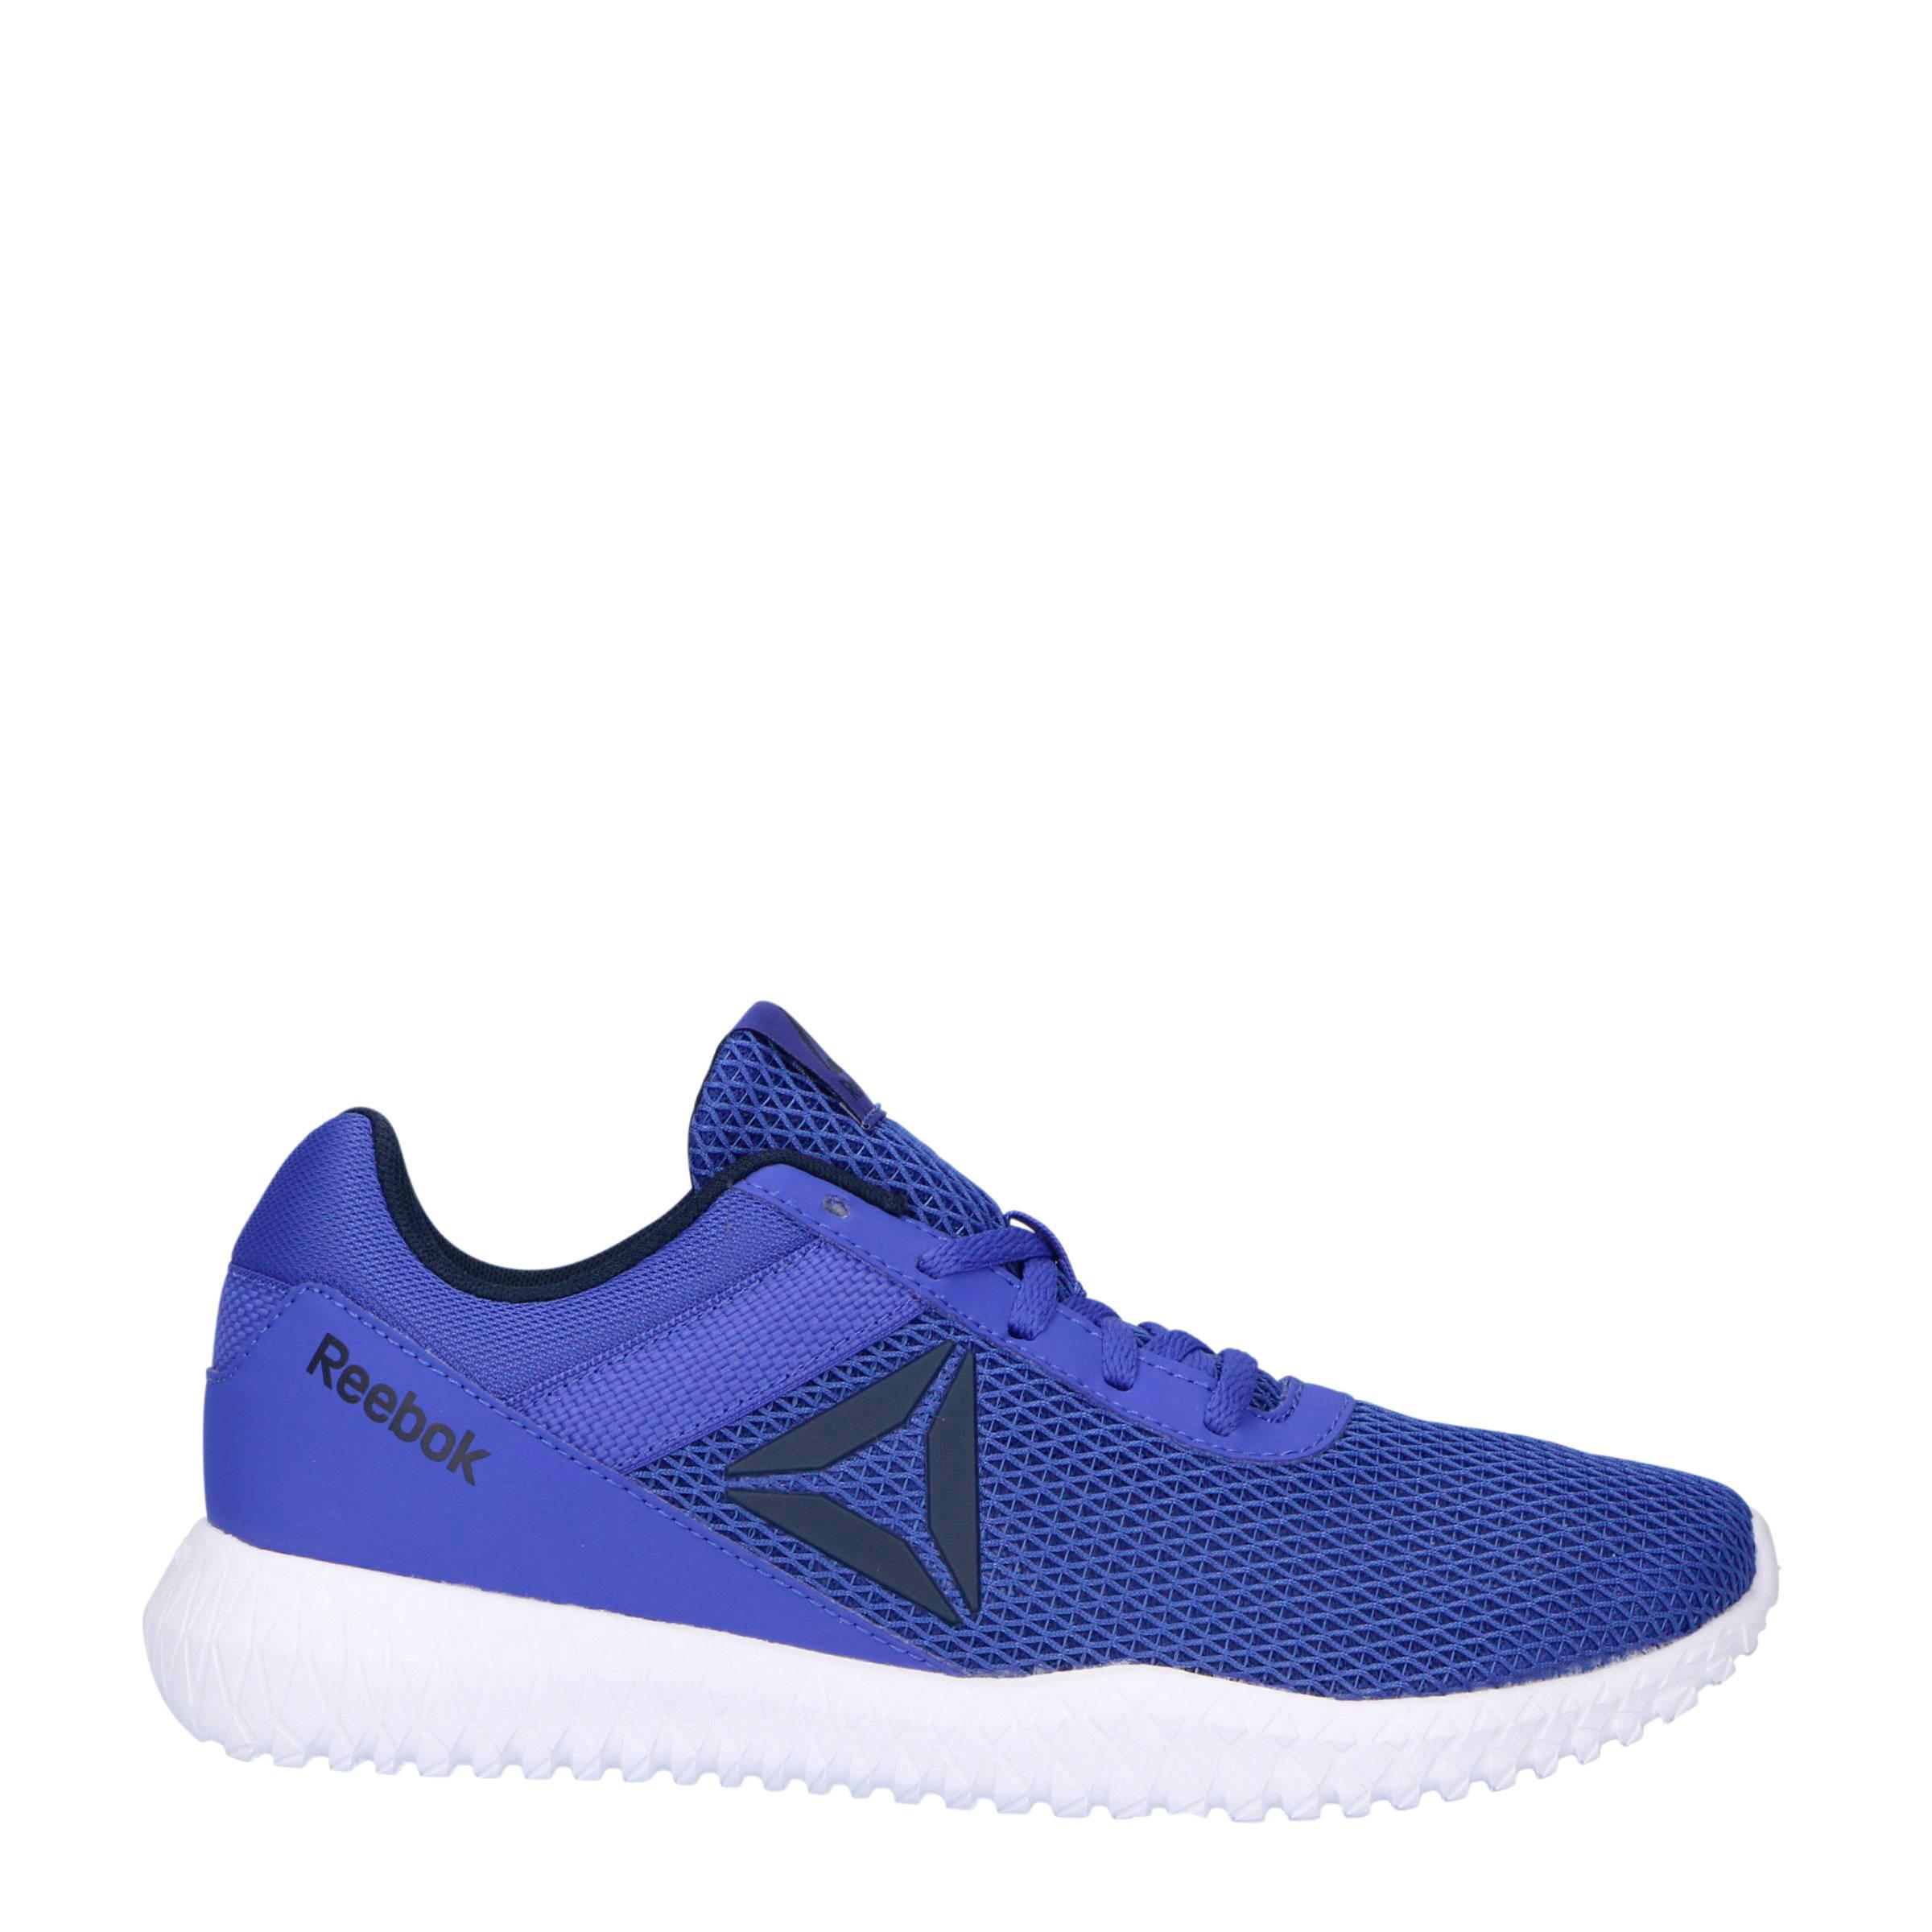 a5ebe184c17 Reebok Flexagon Energy TR fitness schoenen | wehkamp